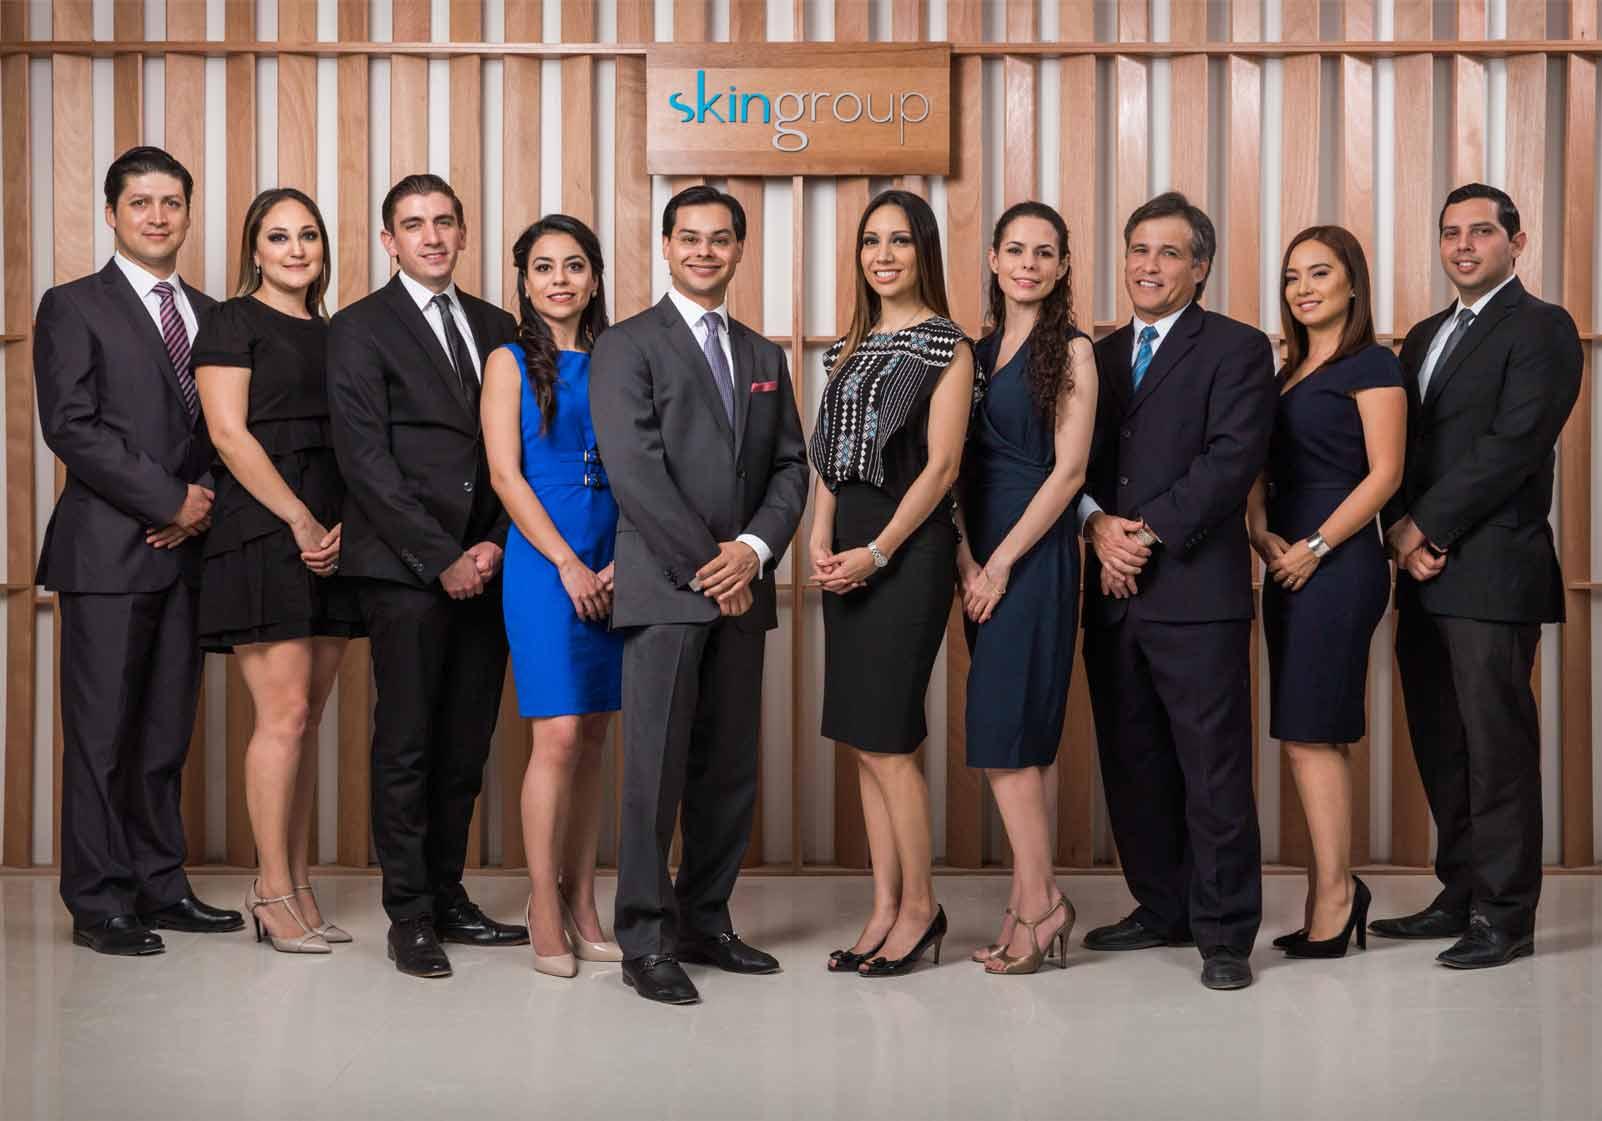 Medicos de Skingroup de gala